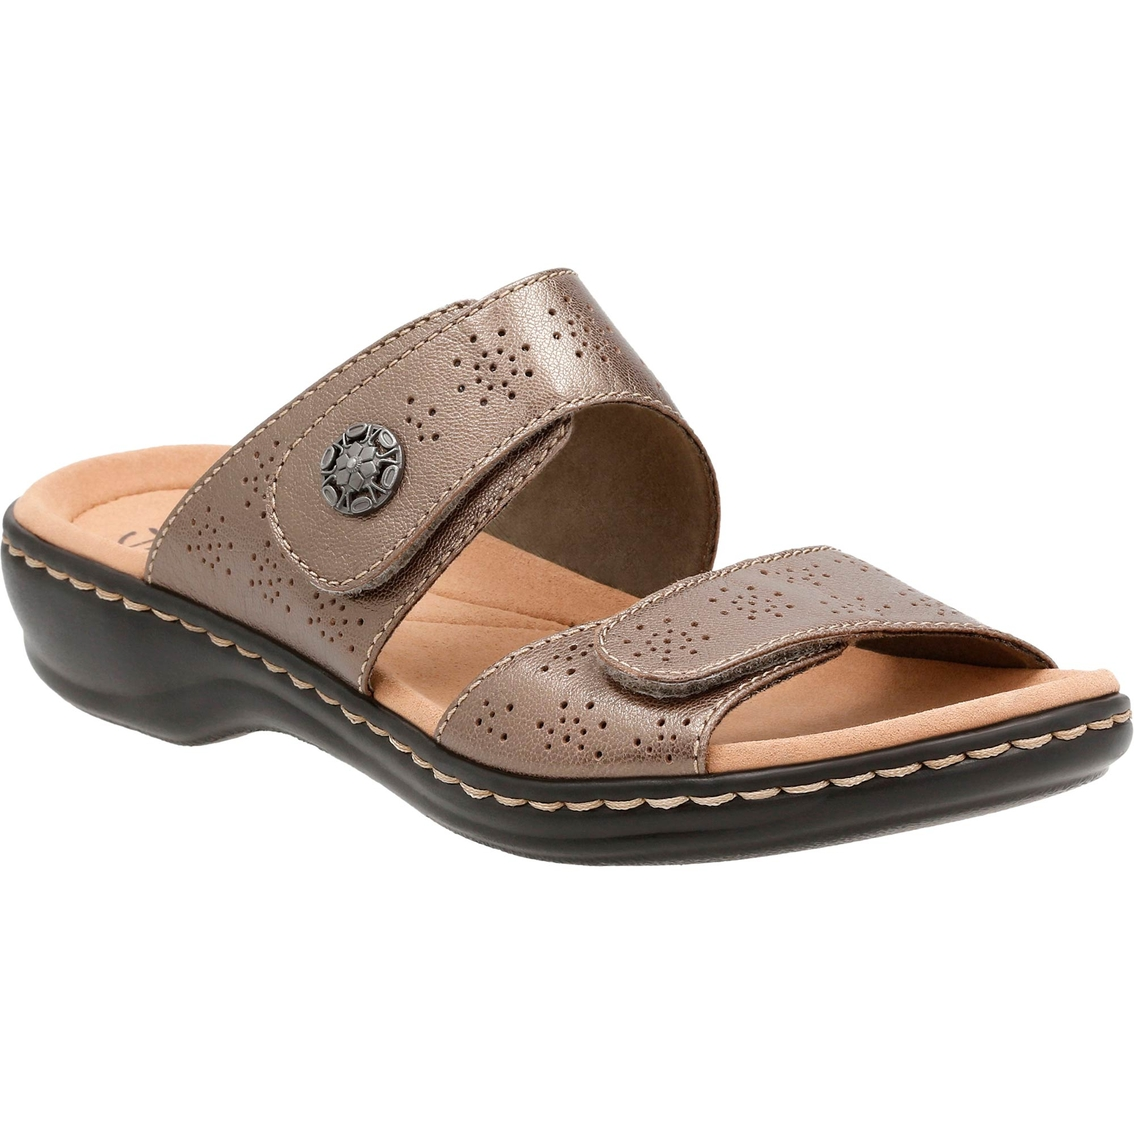 Clarks Women's Leisa Lacole Two Strap Velcro Sandals